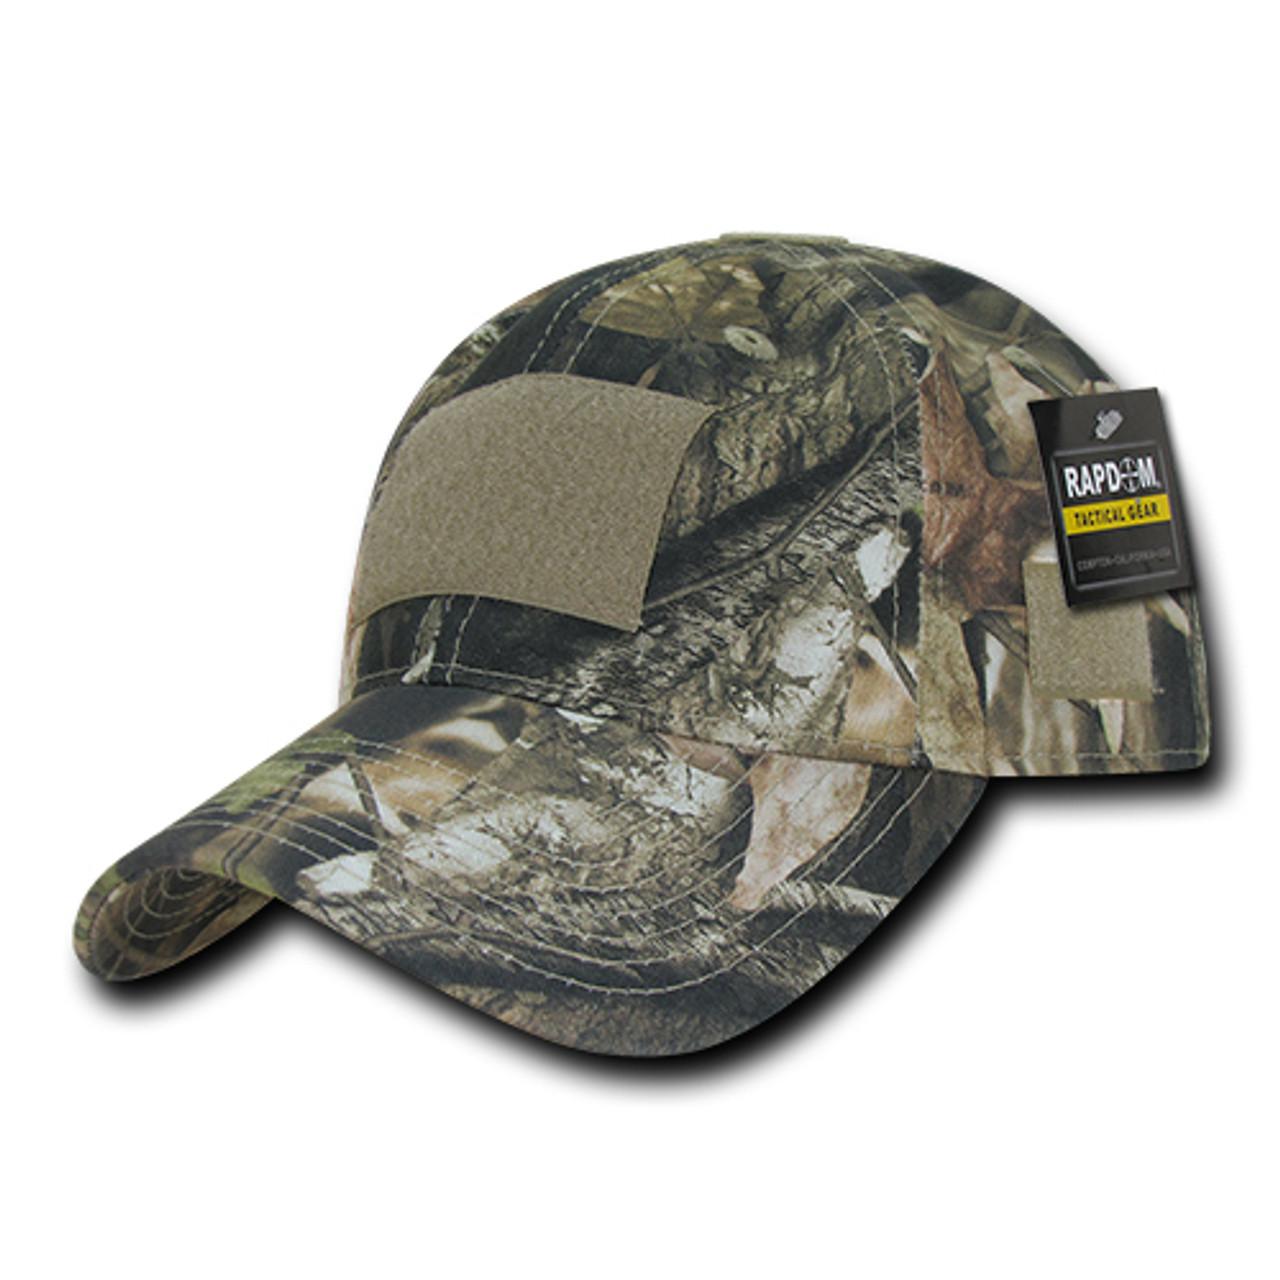 Camo Camouflage Gray Bark Black Hunting Fishing Curved Trucker Snapback Hat Cap